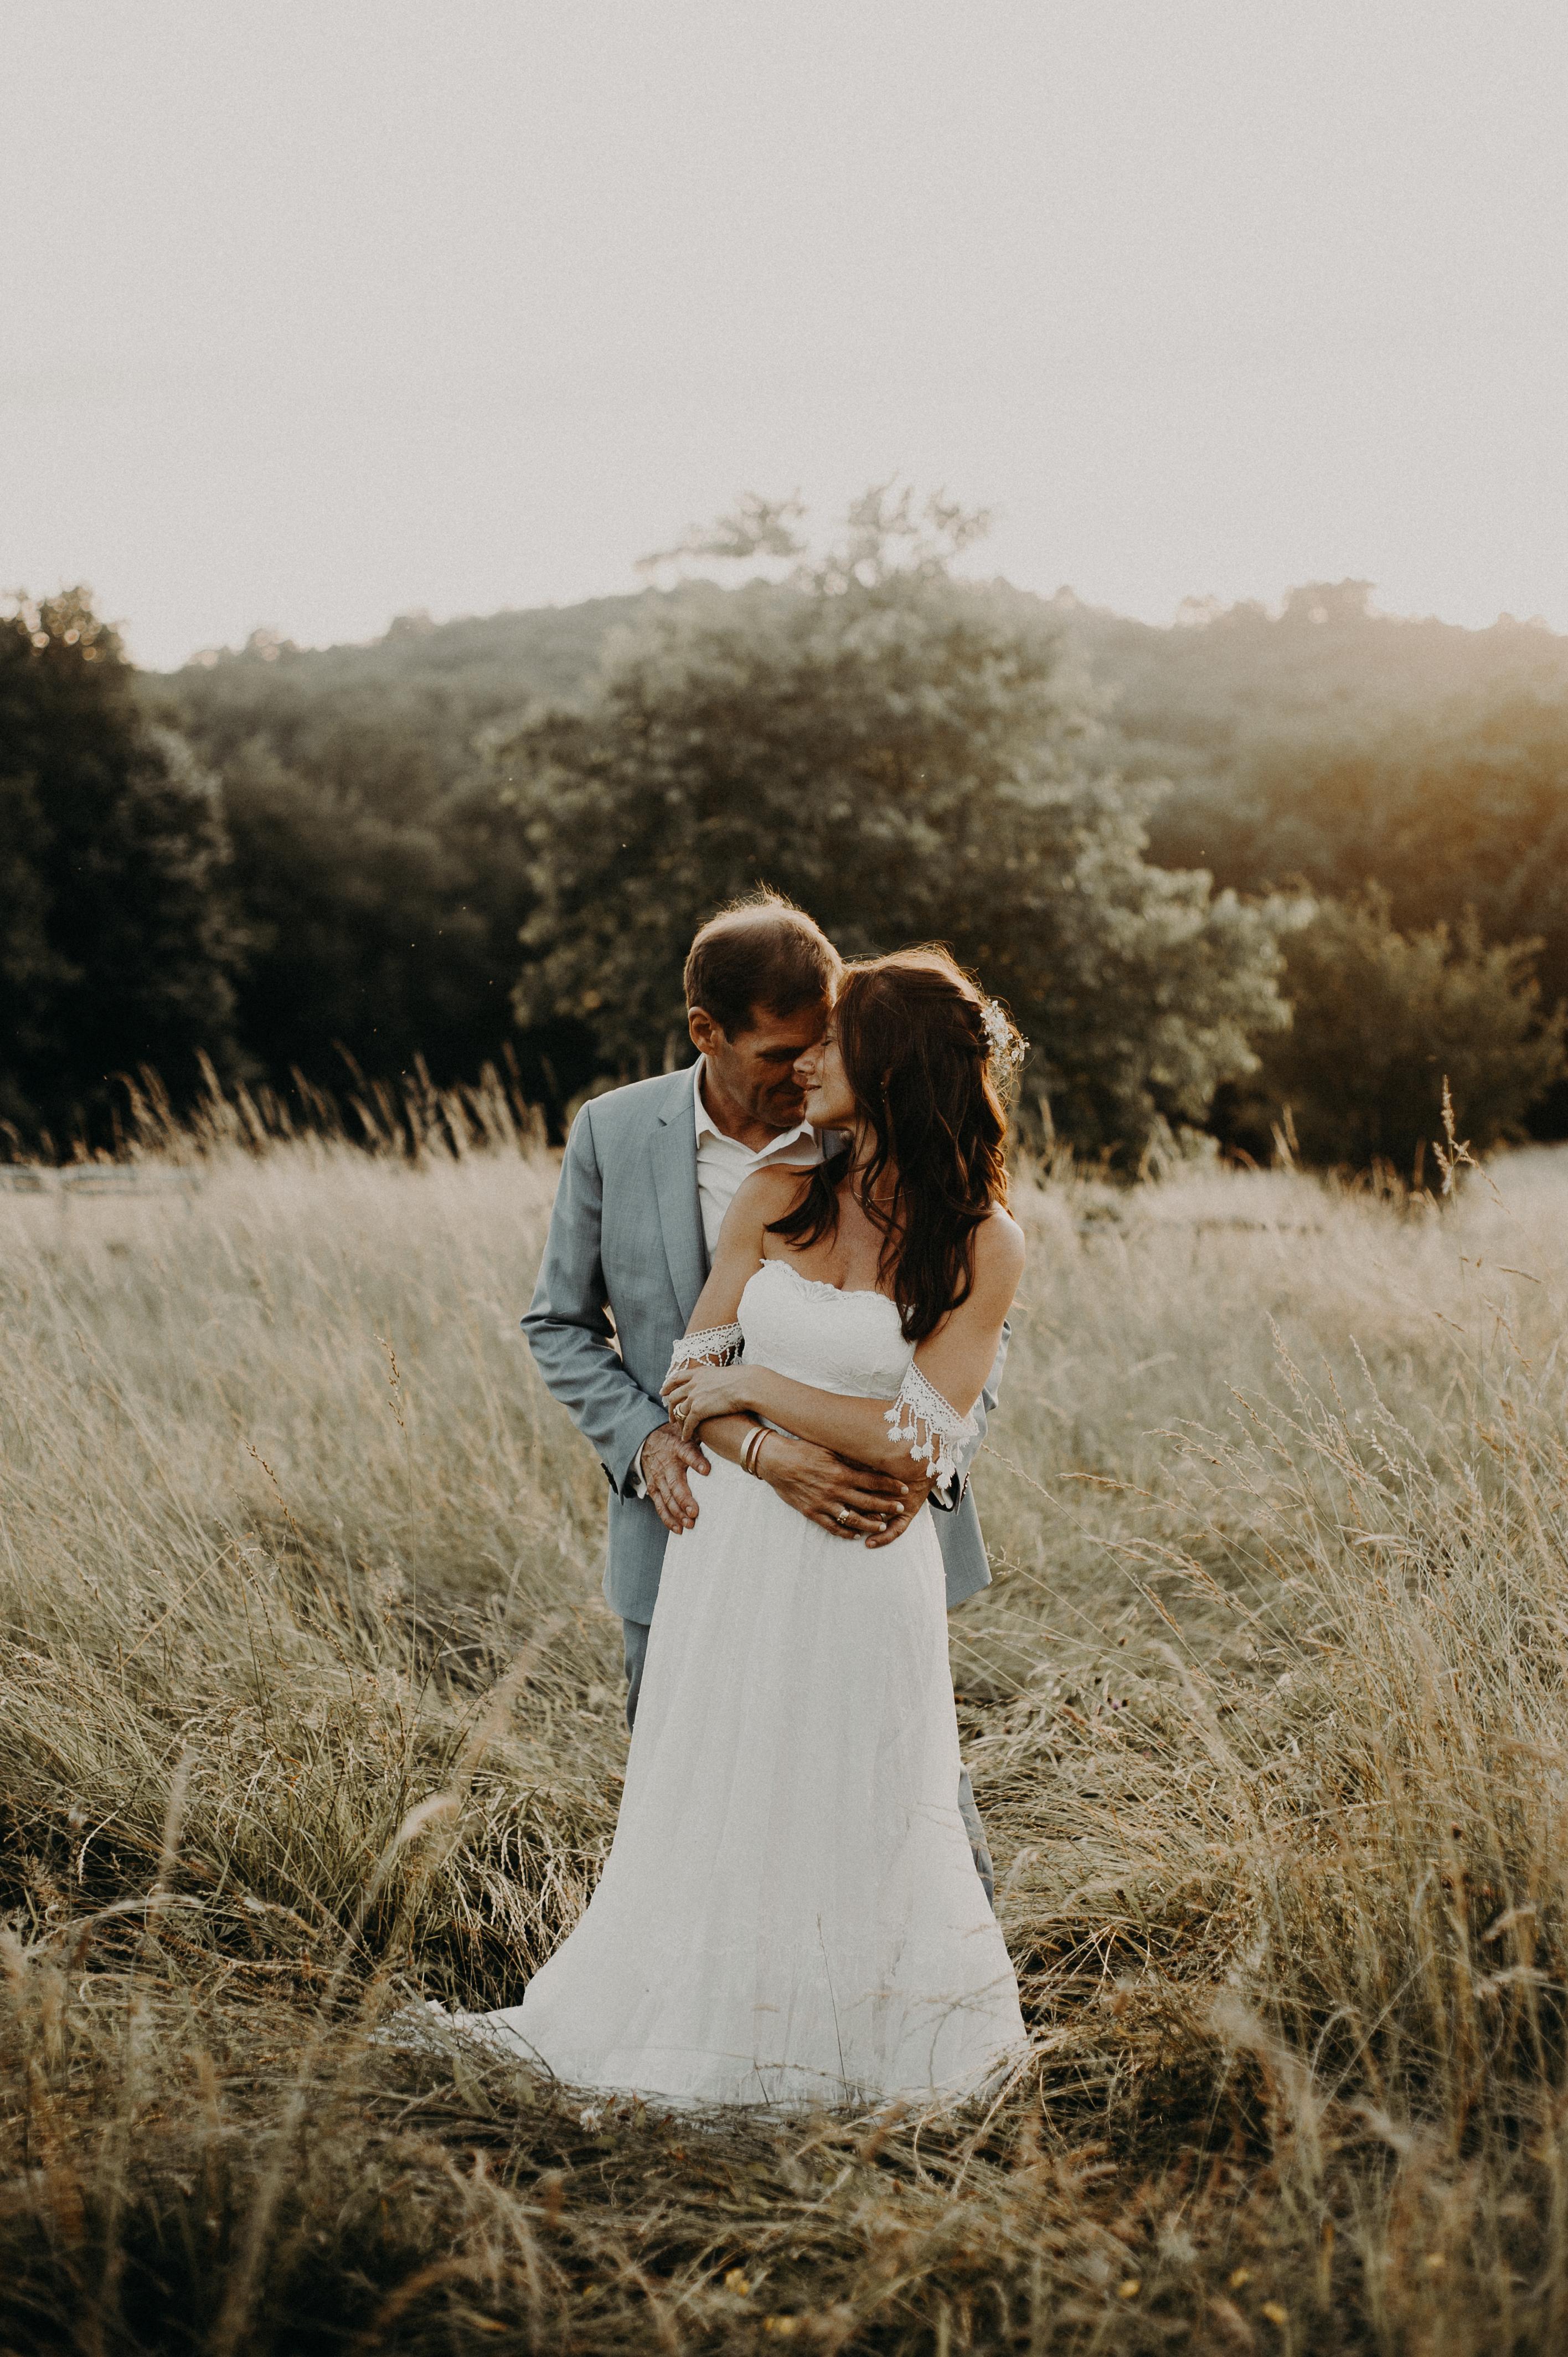 photographe mariage dordogne bordeaux couple boheme